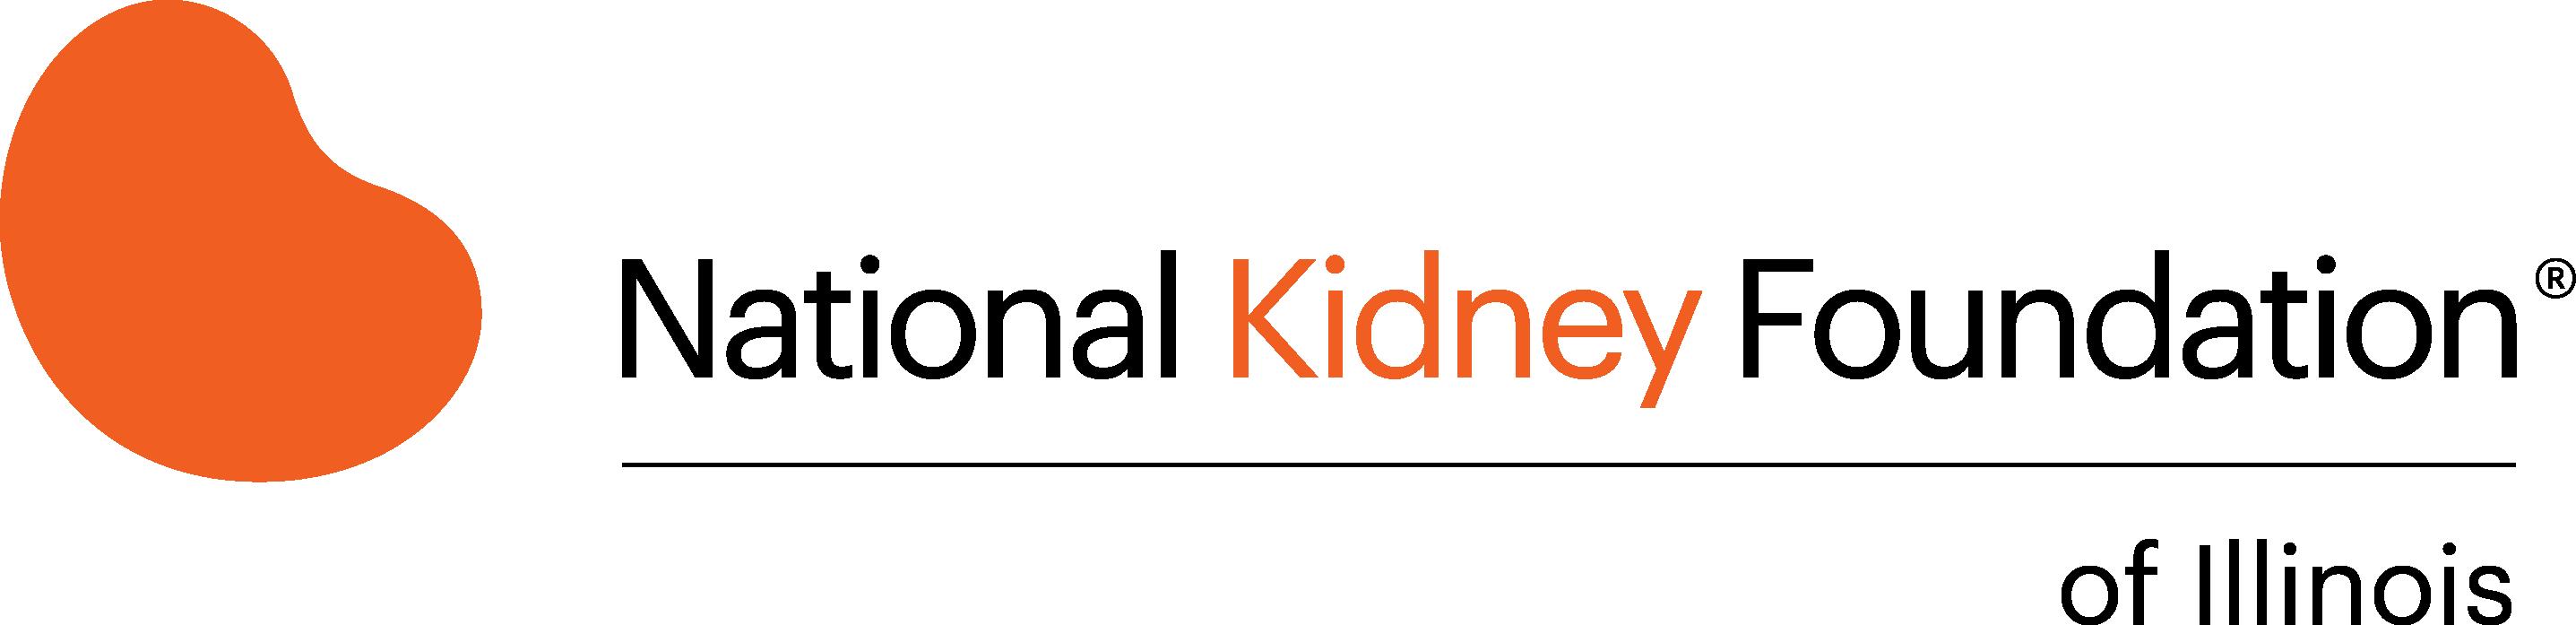 NKFI Kidney Camp Survey